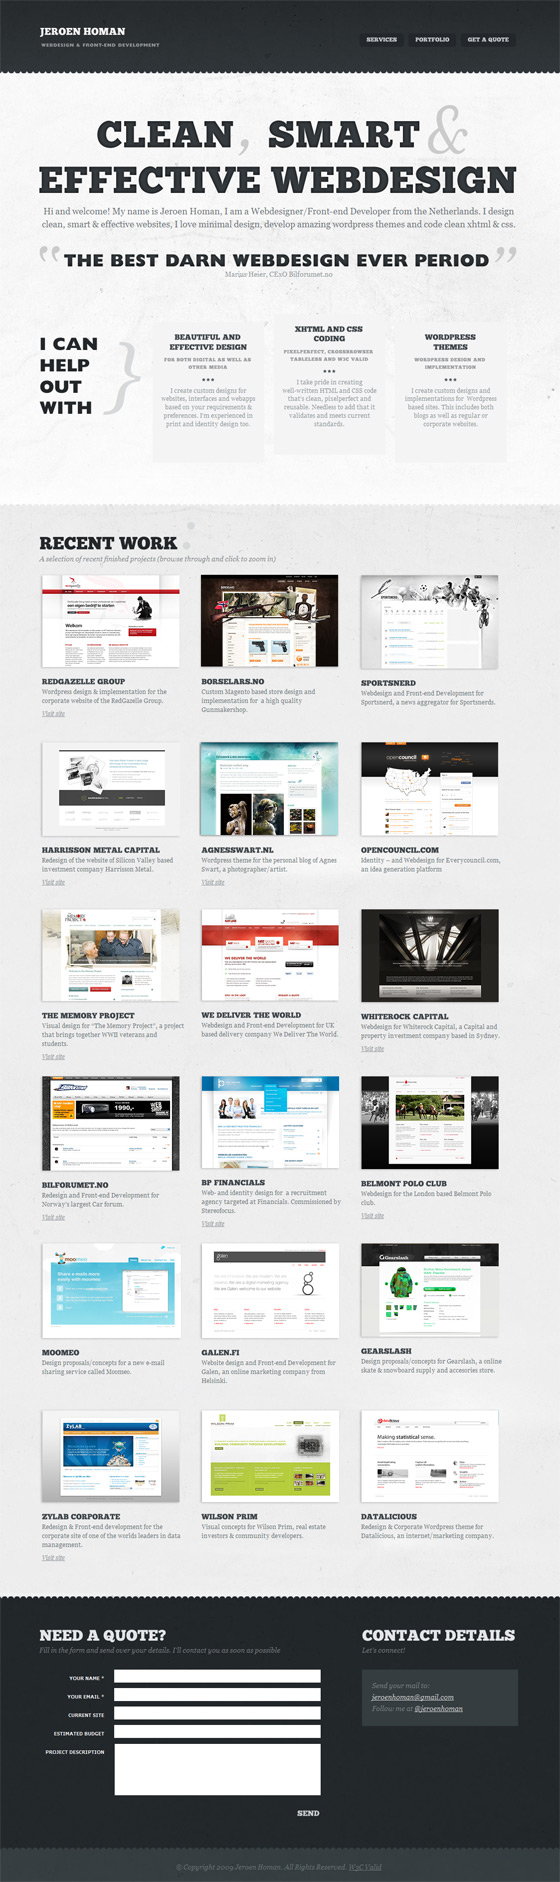 Jeroen Homan | Web Design